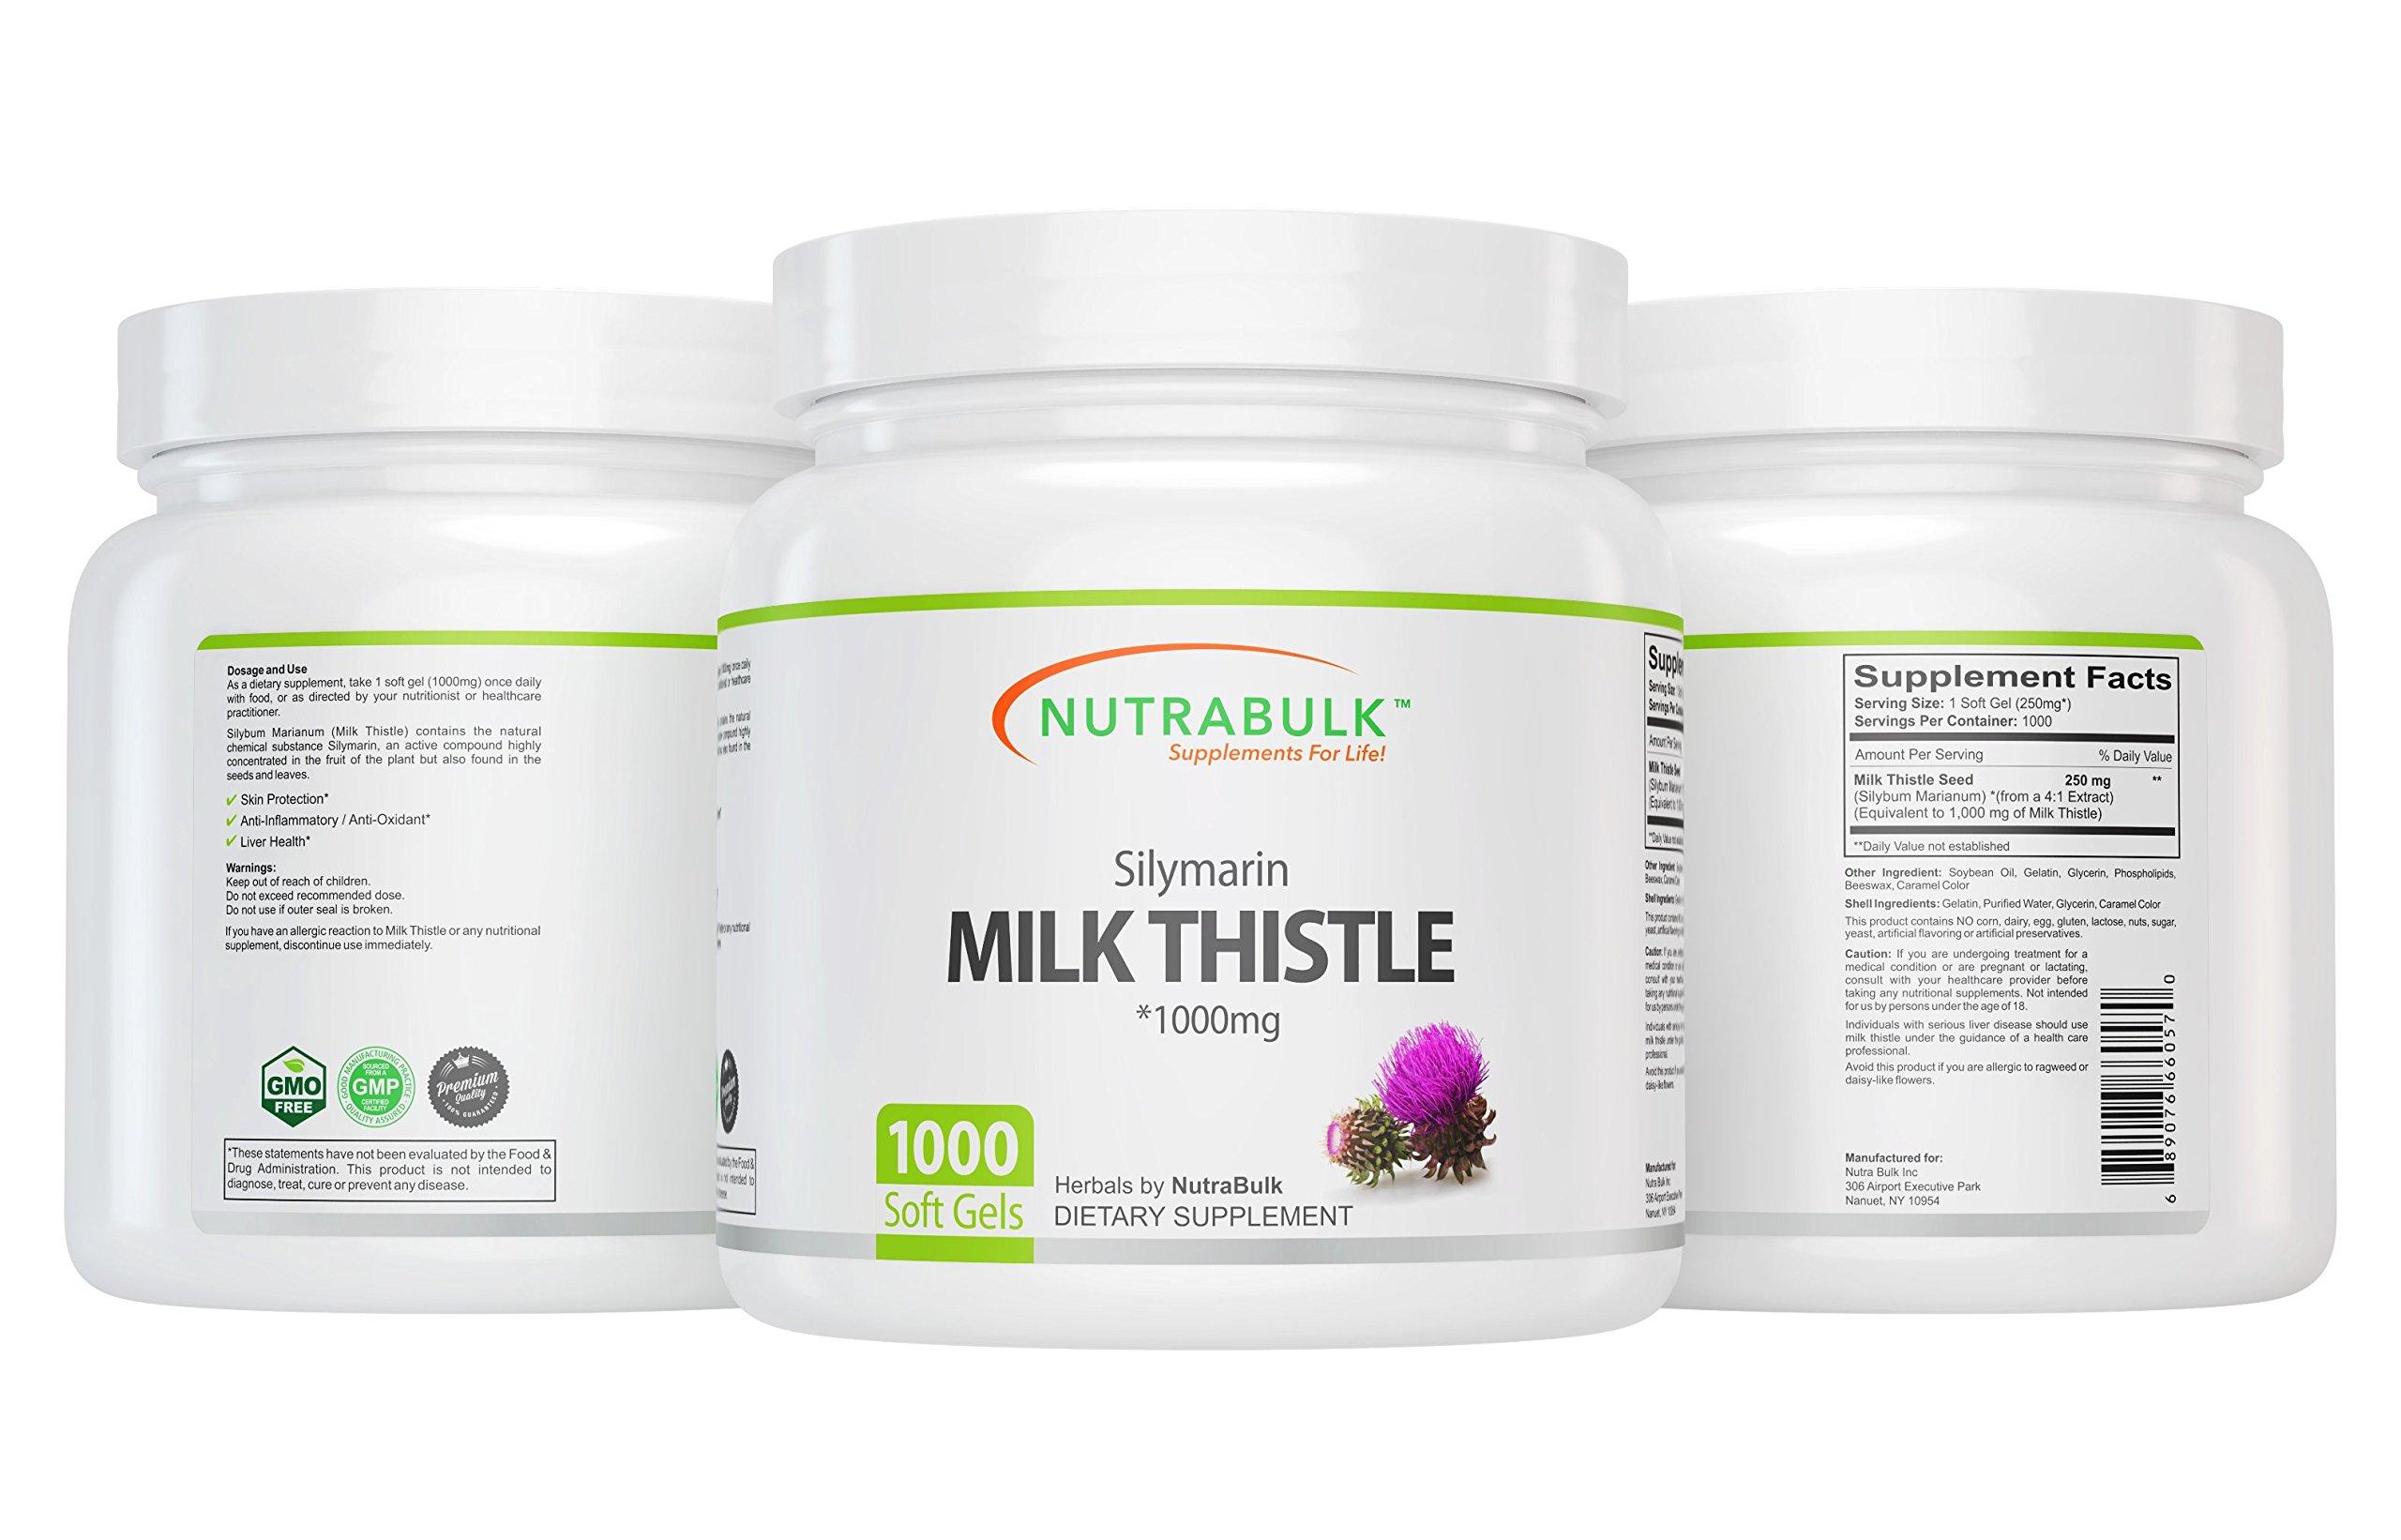 NutraBulk Milk Thistle -1000mg Soft Gels 1000 Count